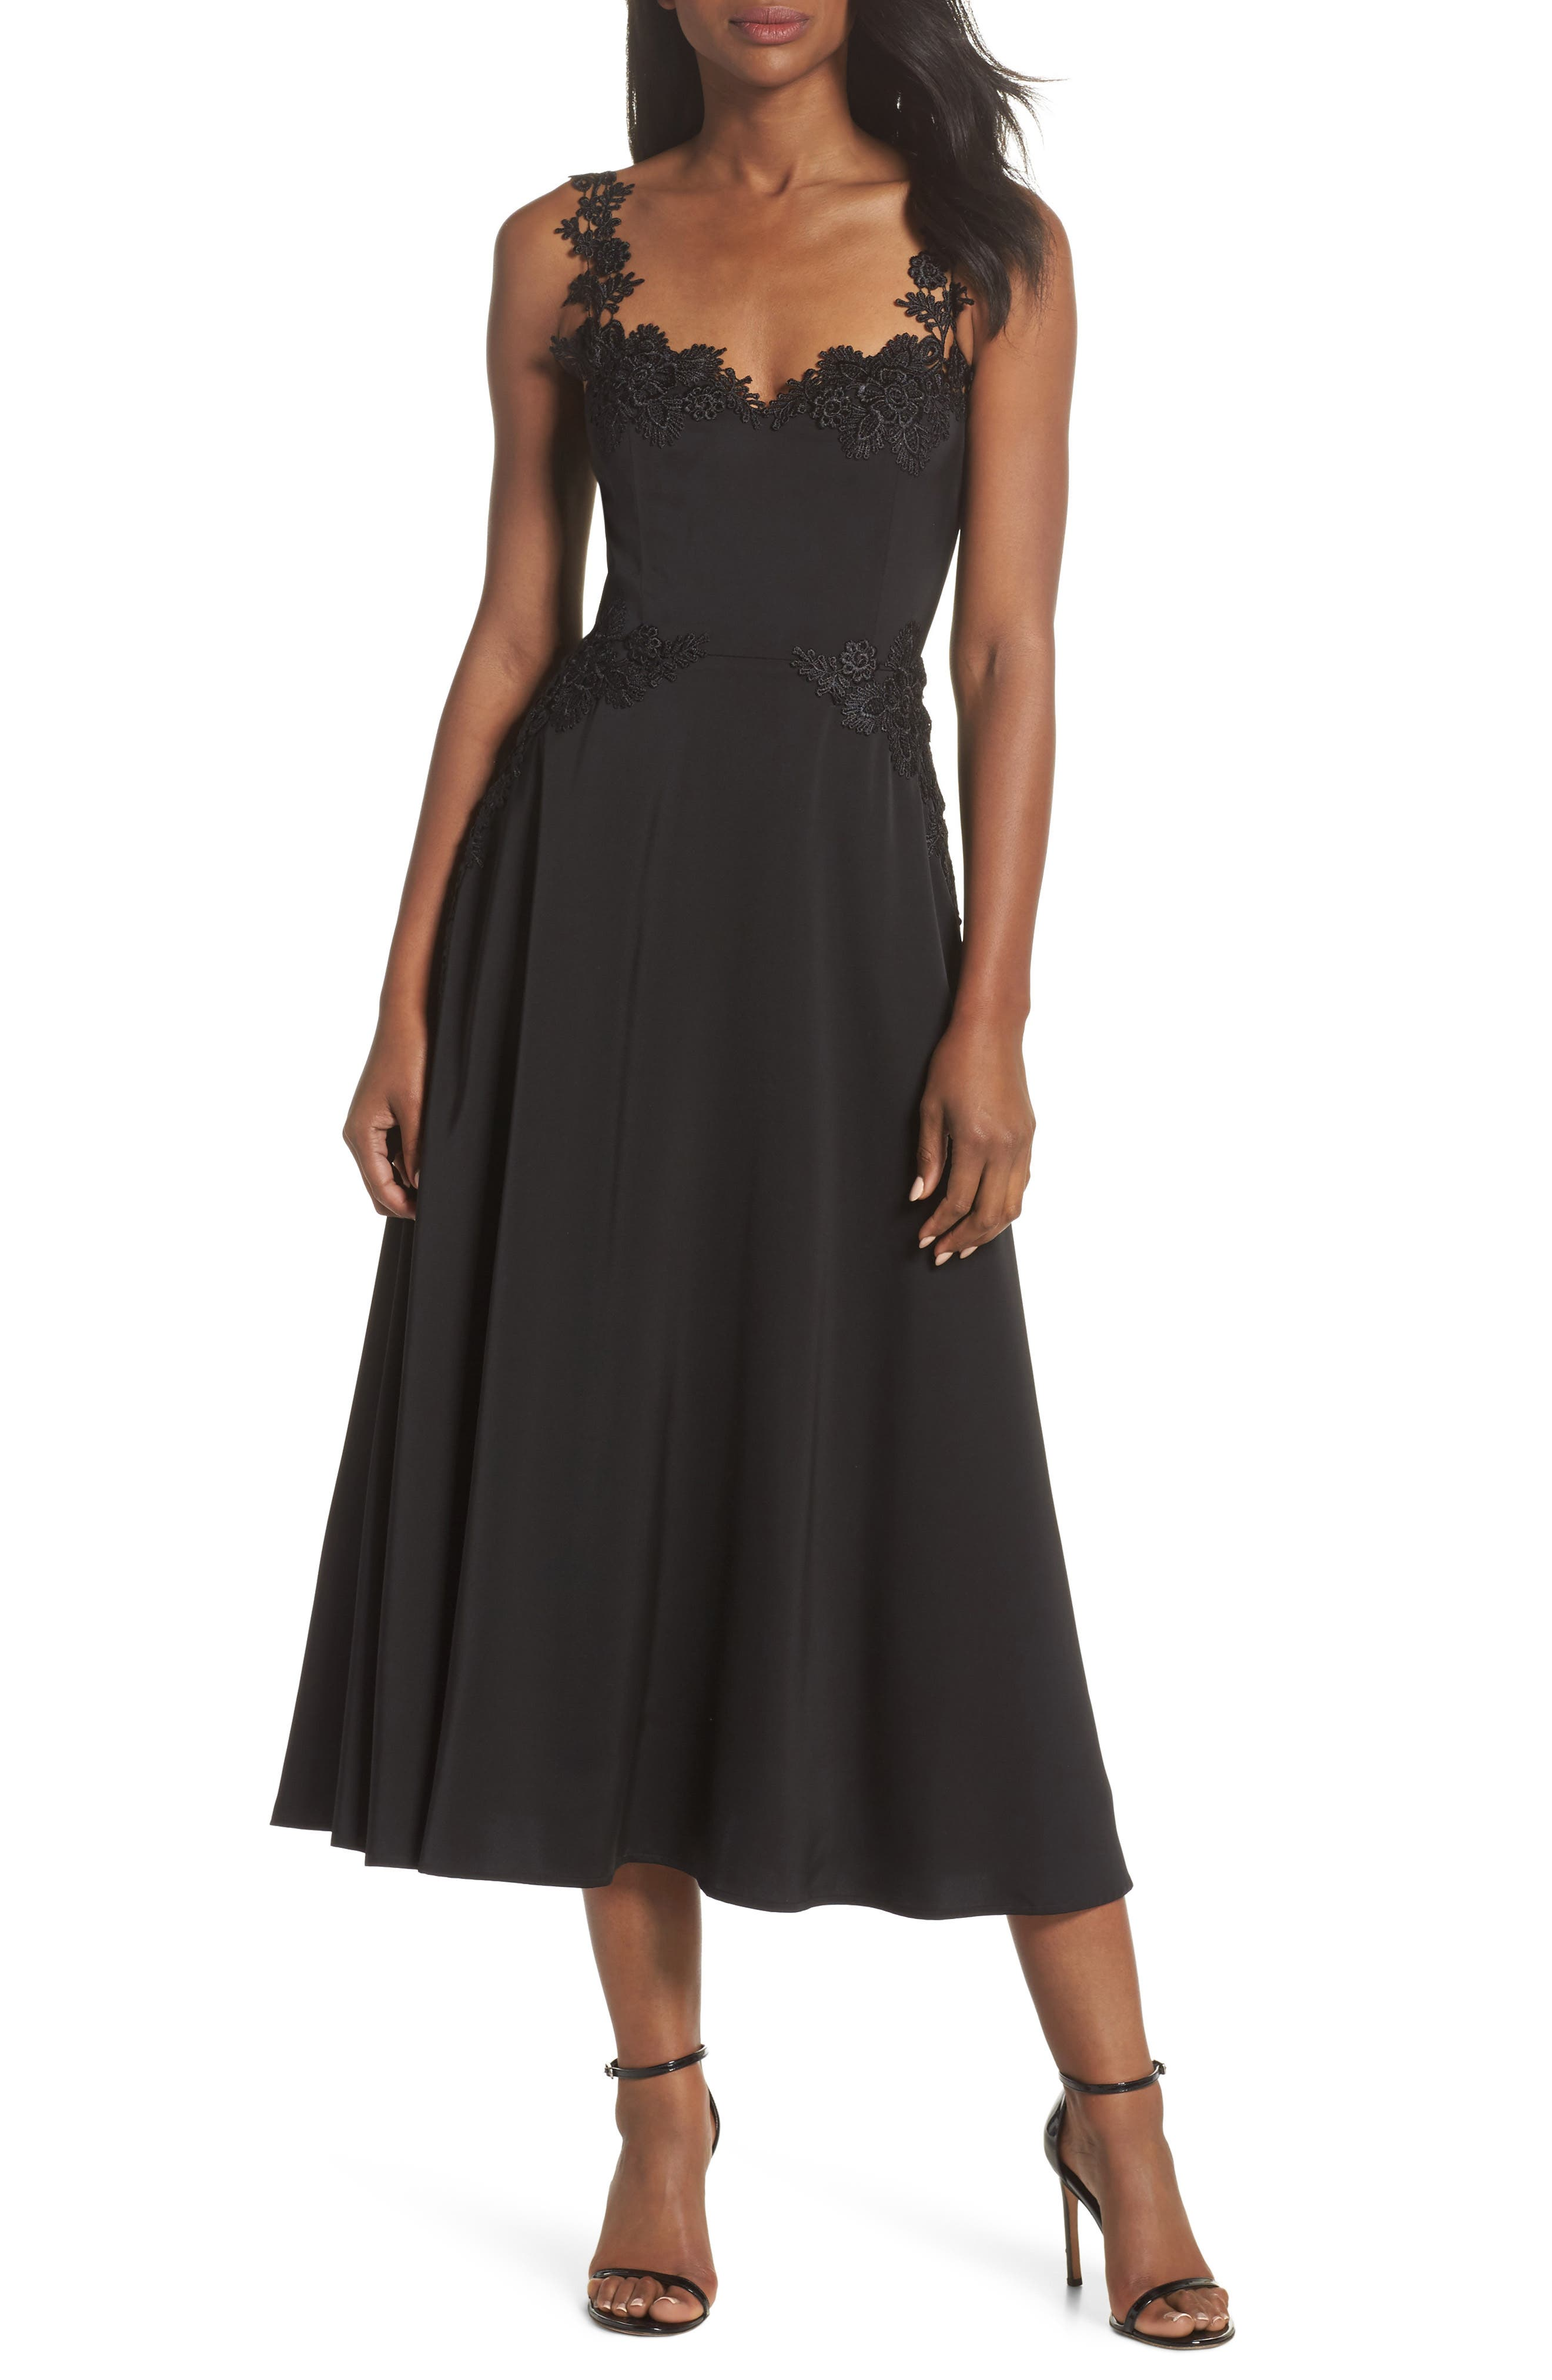 Aislinn Floral Appliqué Tea Length Dress,                             Main thumbnail 1, color,                             Black Multi